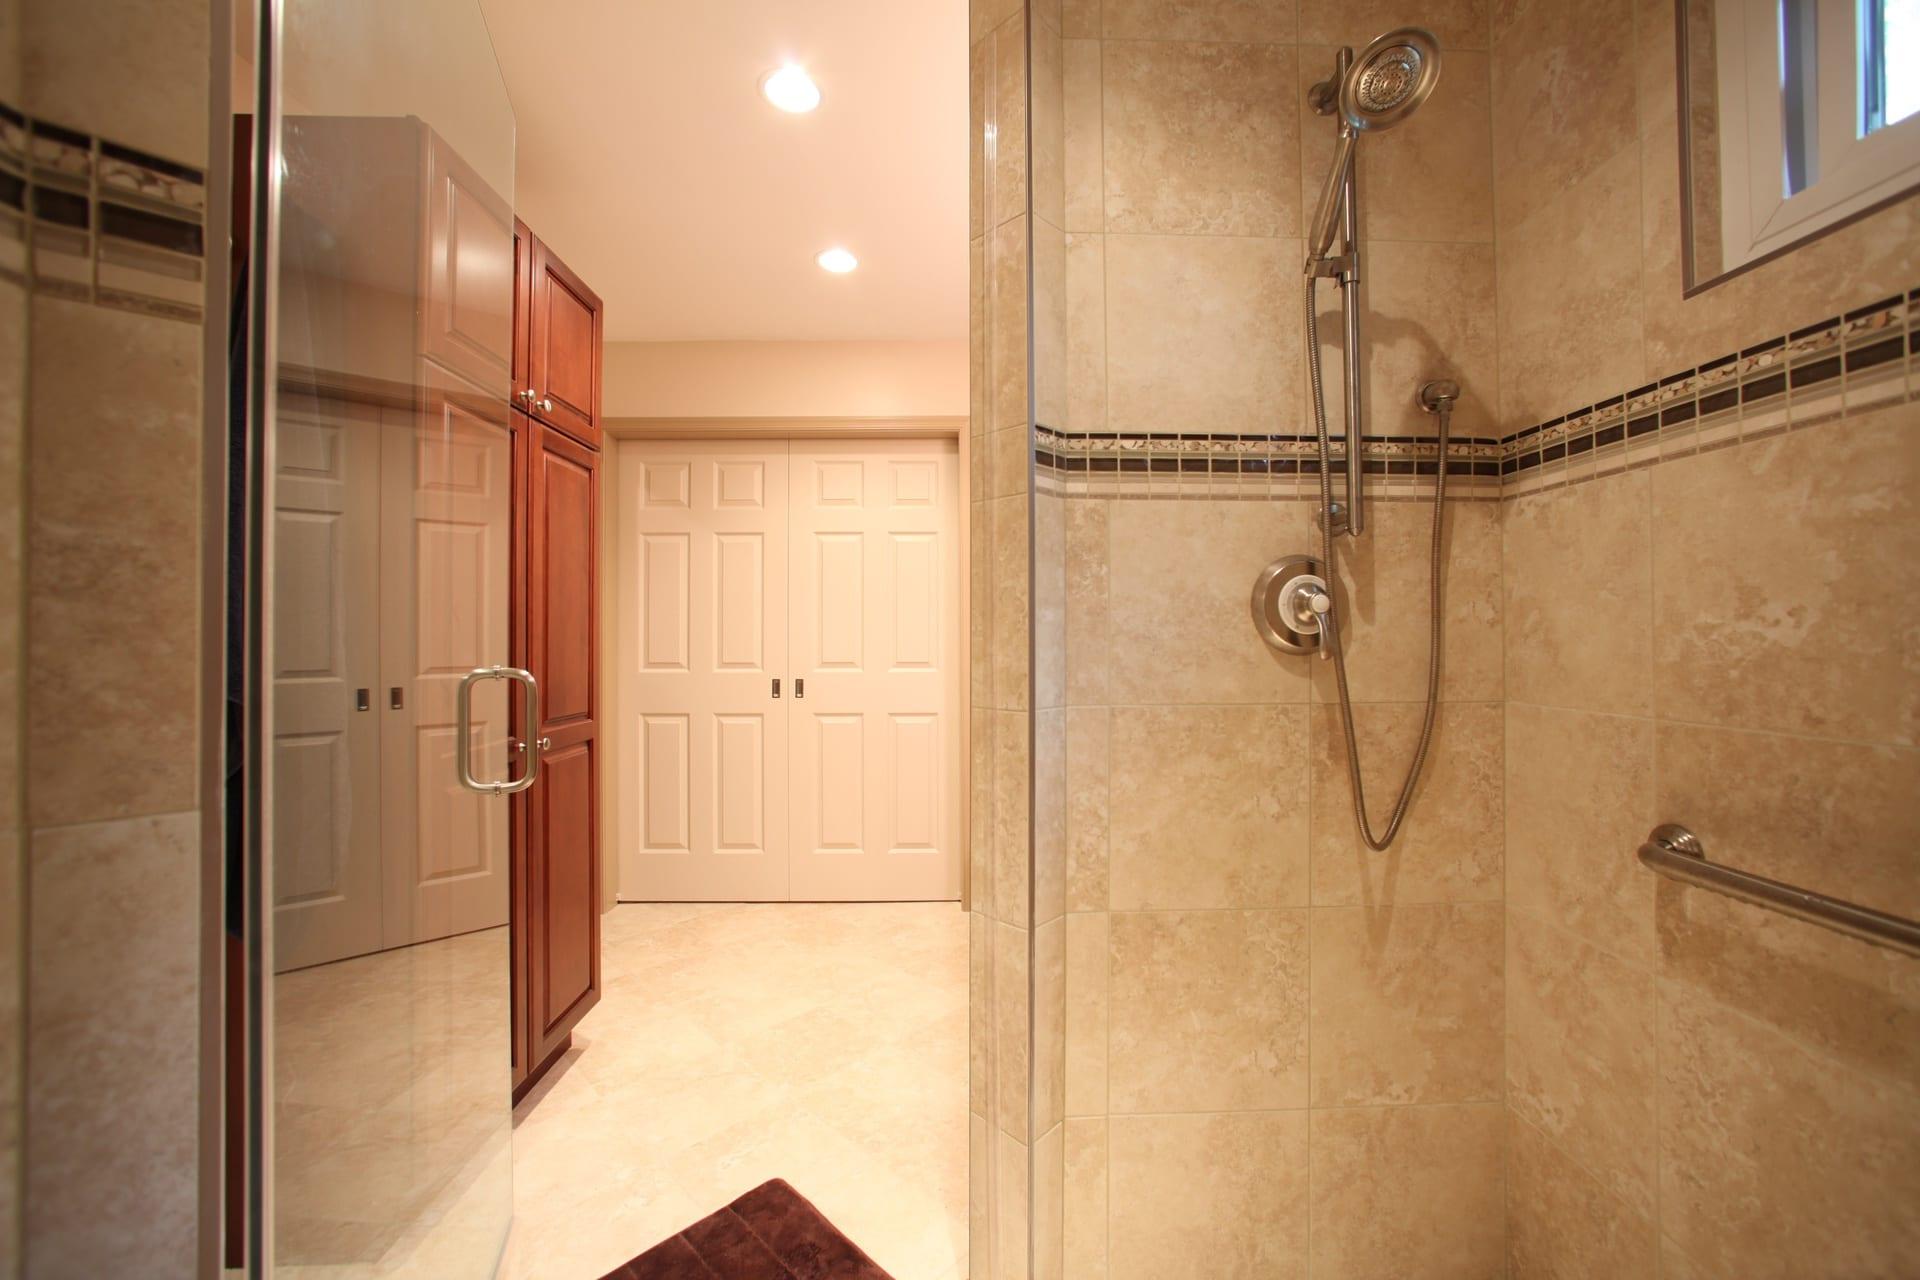 Bathroom Remodel - Hambleton Construction (5)